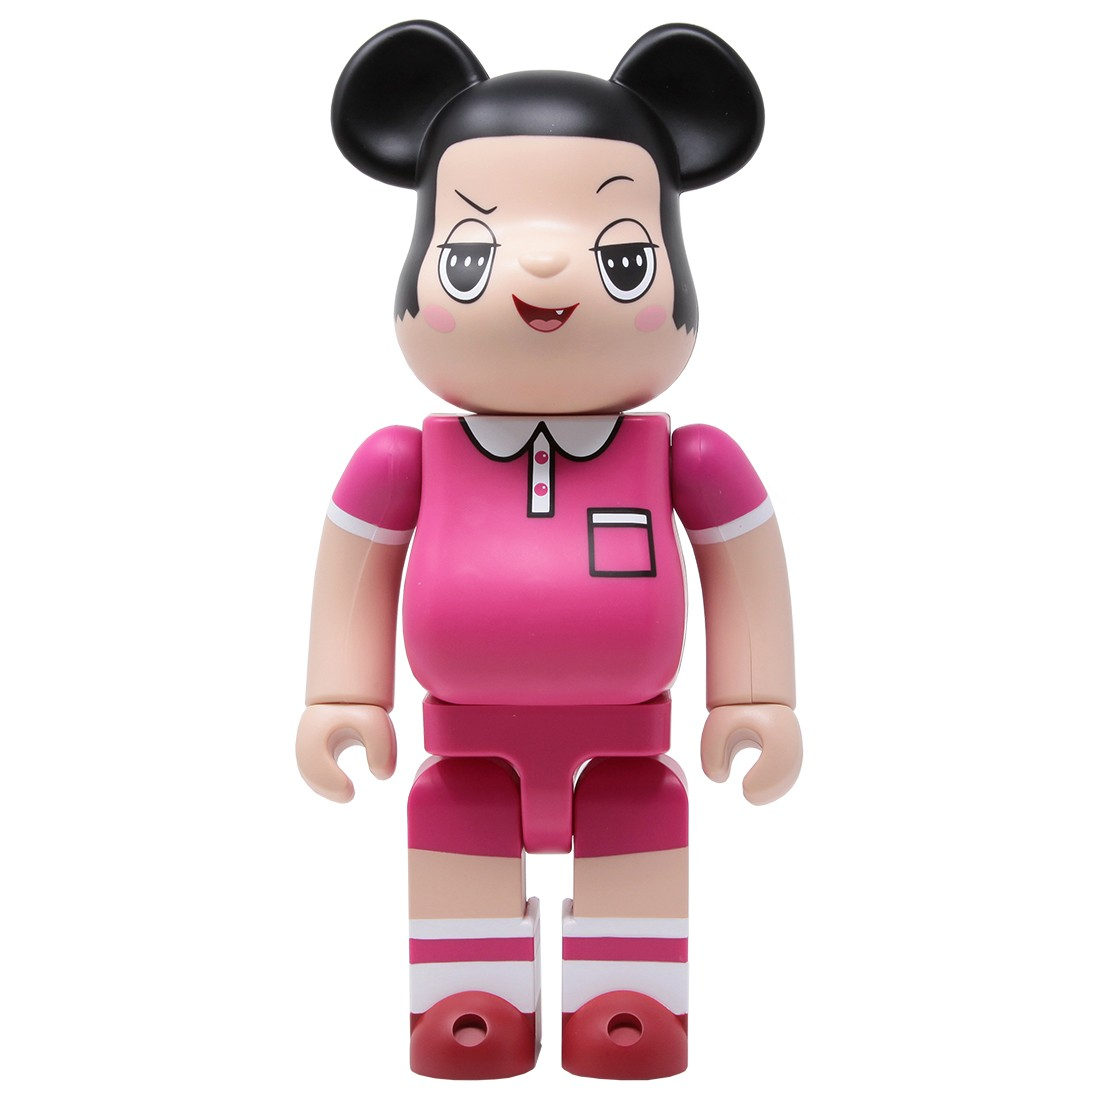 Medicom Chico Chan 400% Bearbrick Figure (pink)